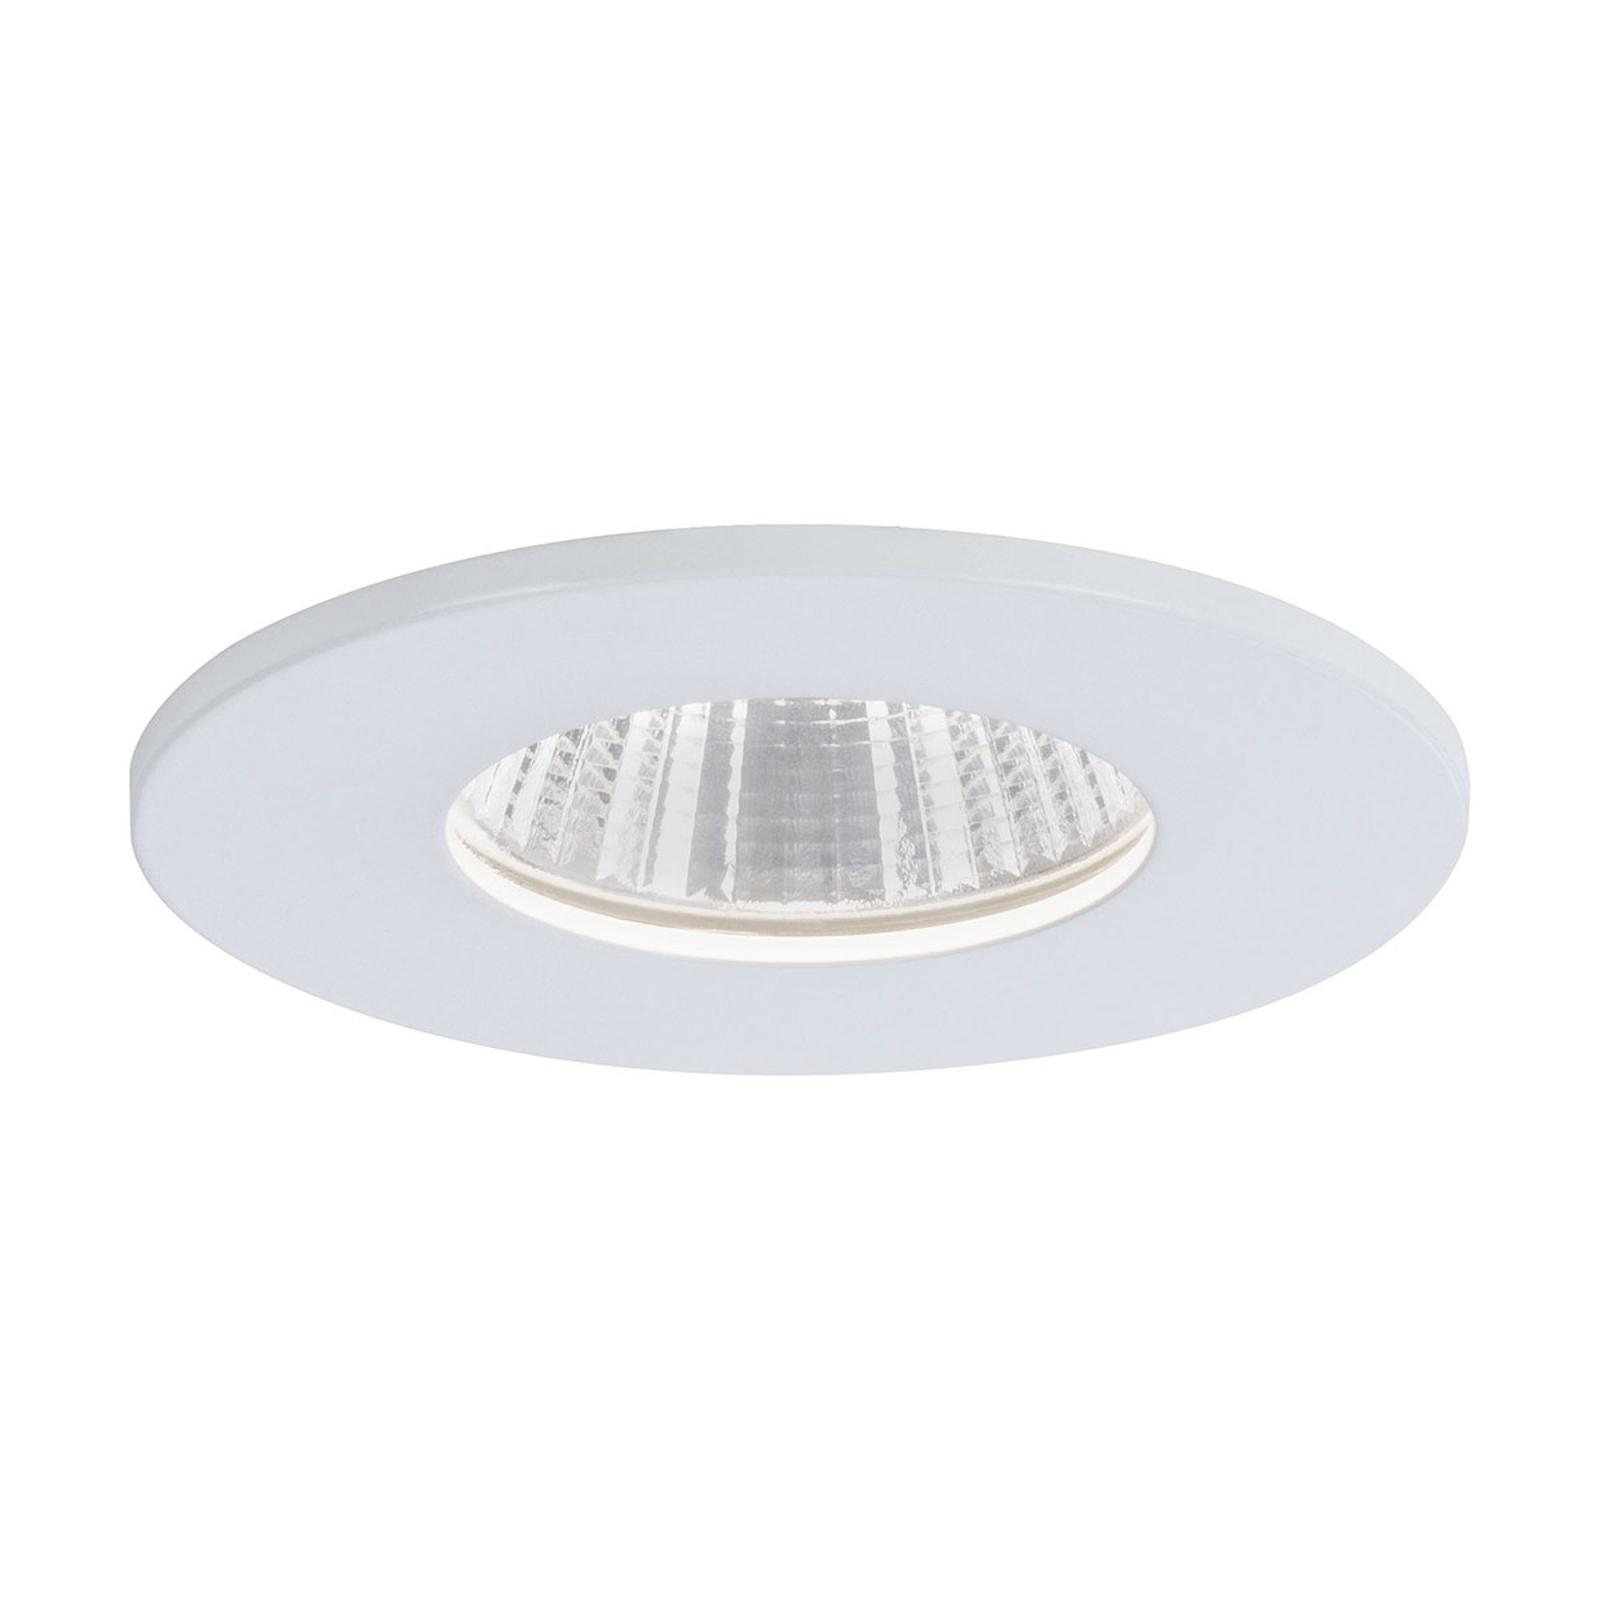 Paulmann LED-Einbaulampe Calla weiß 1x7W IP65